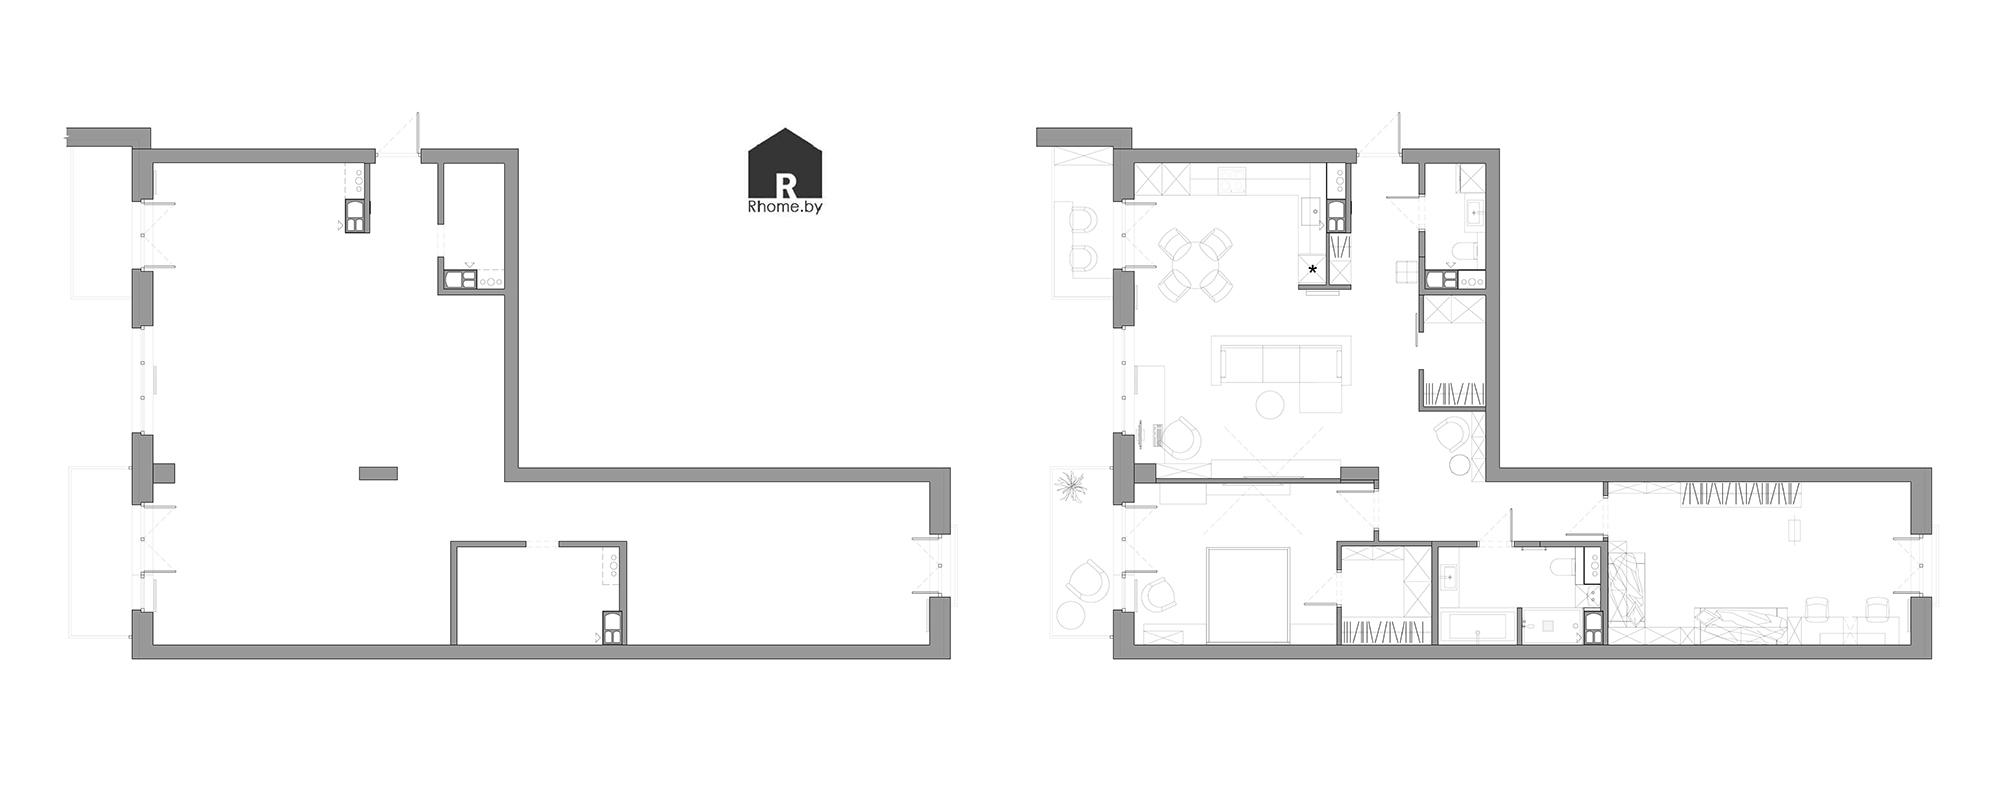 Планировка квартиры в ЖК «Олимпик Парк» | Дизайн студия – Rhome.by